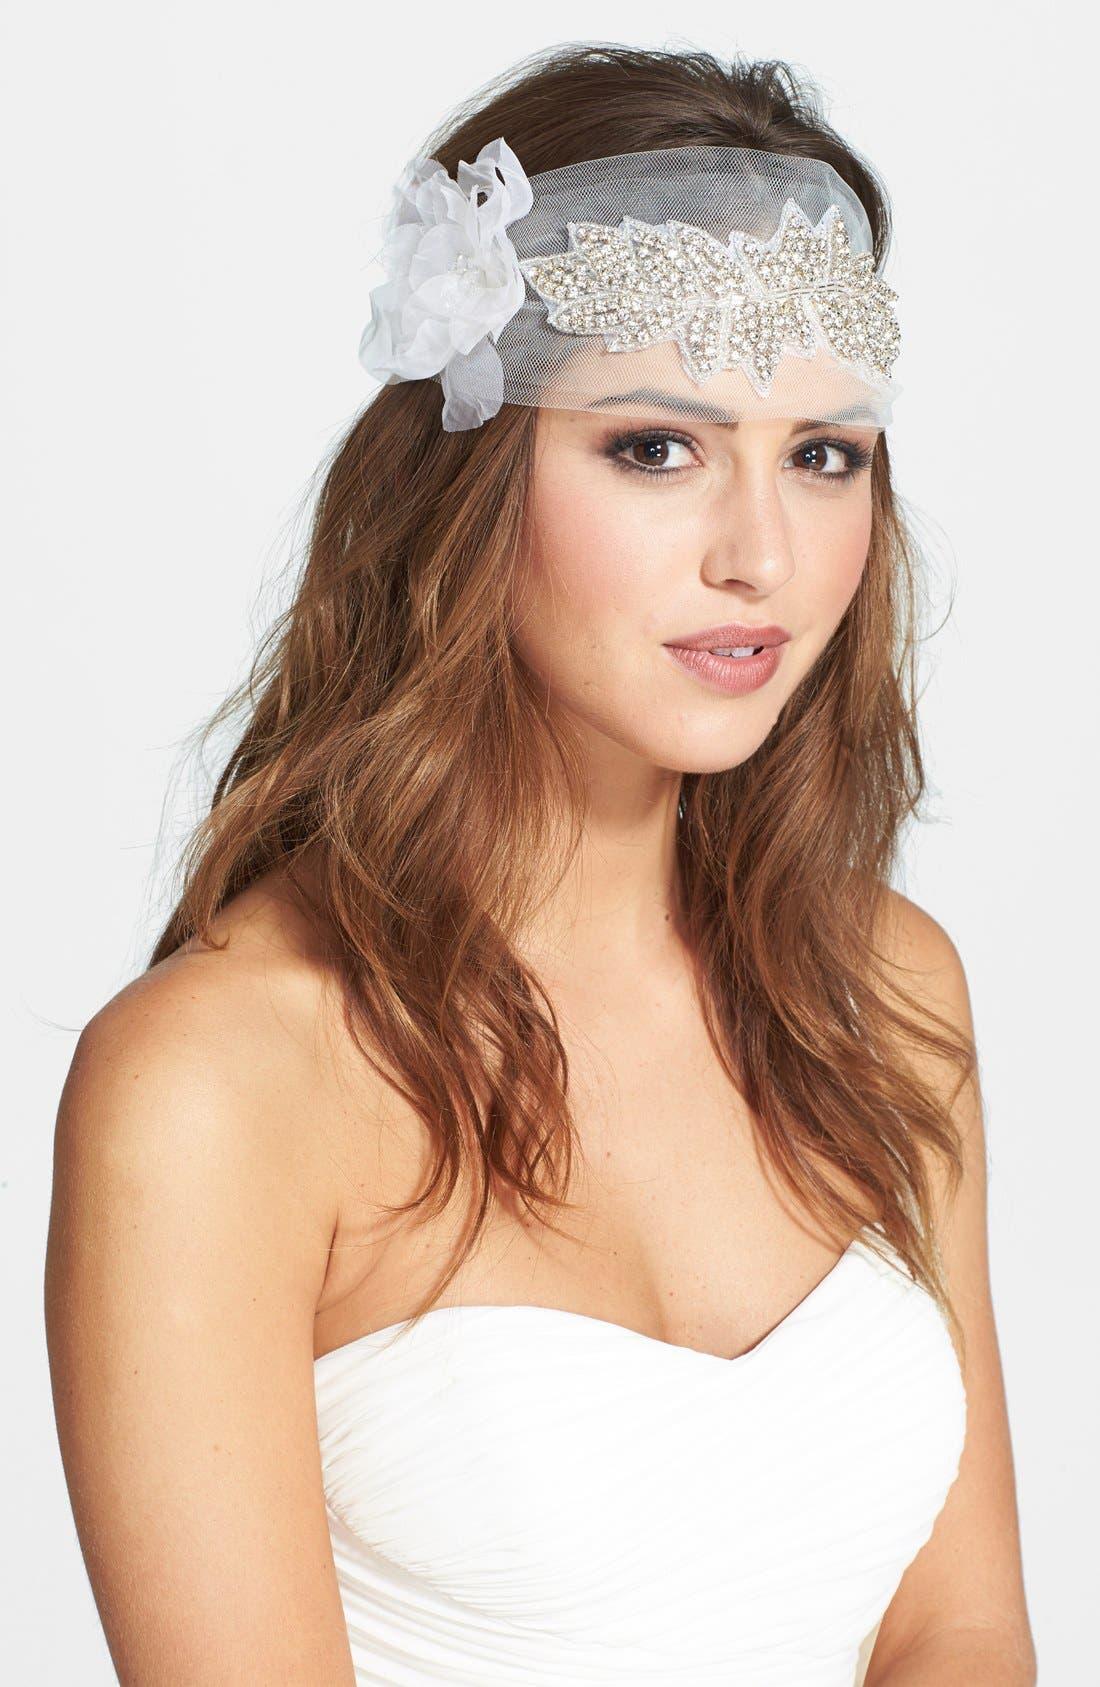 Alternate Image 1 Selected - Serephine 'Francesca' Headpiece/Sash